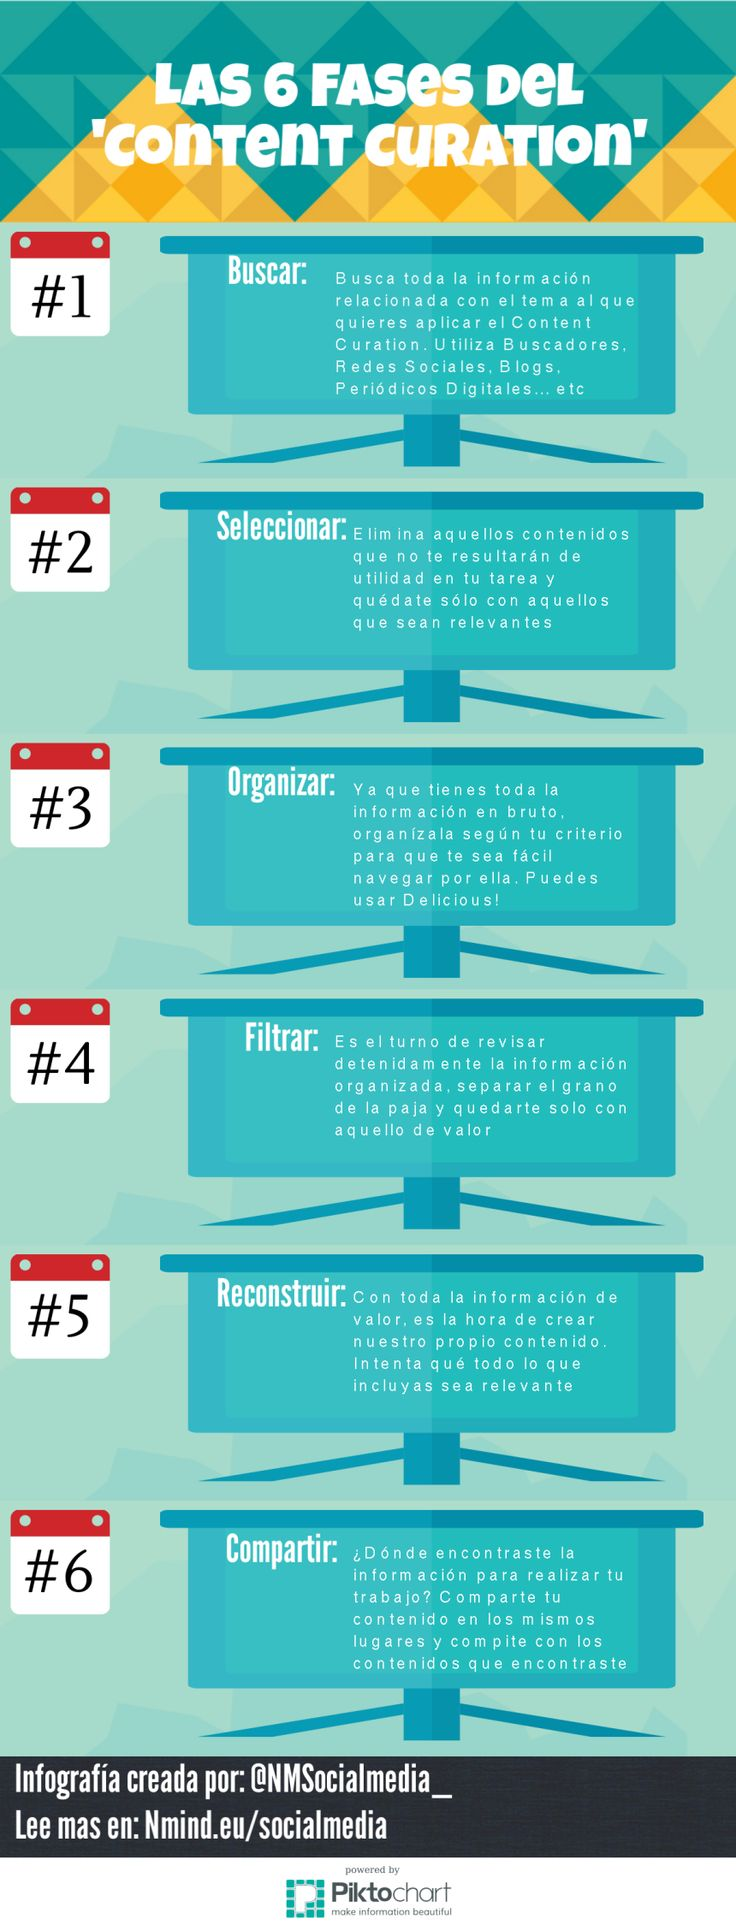 Las 6 etapas de la Curación de Contenido #infografia #infographic #socialmedia